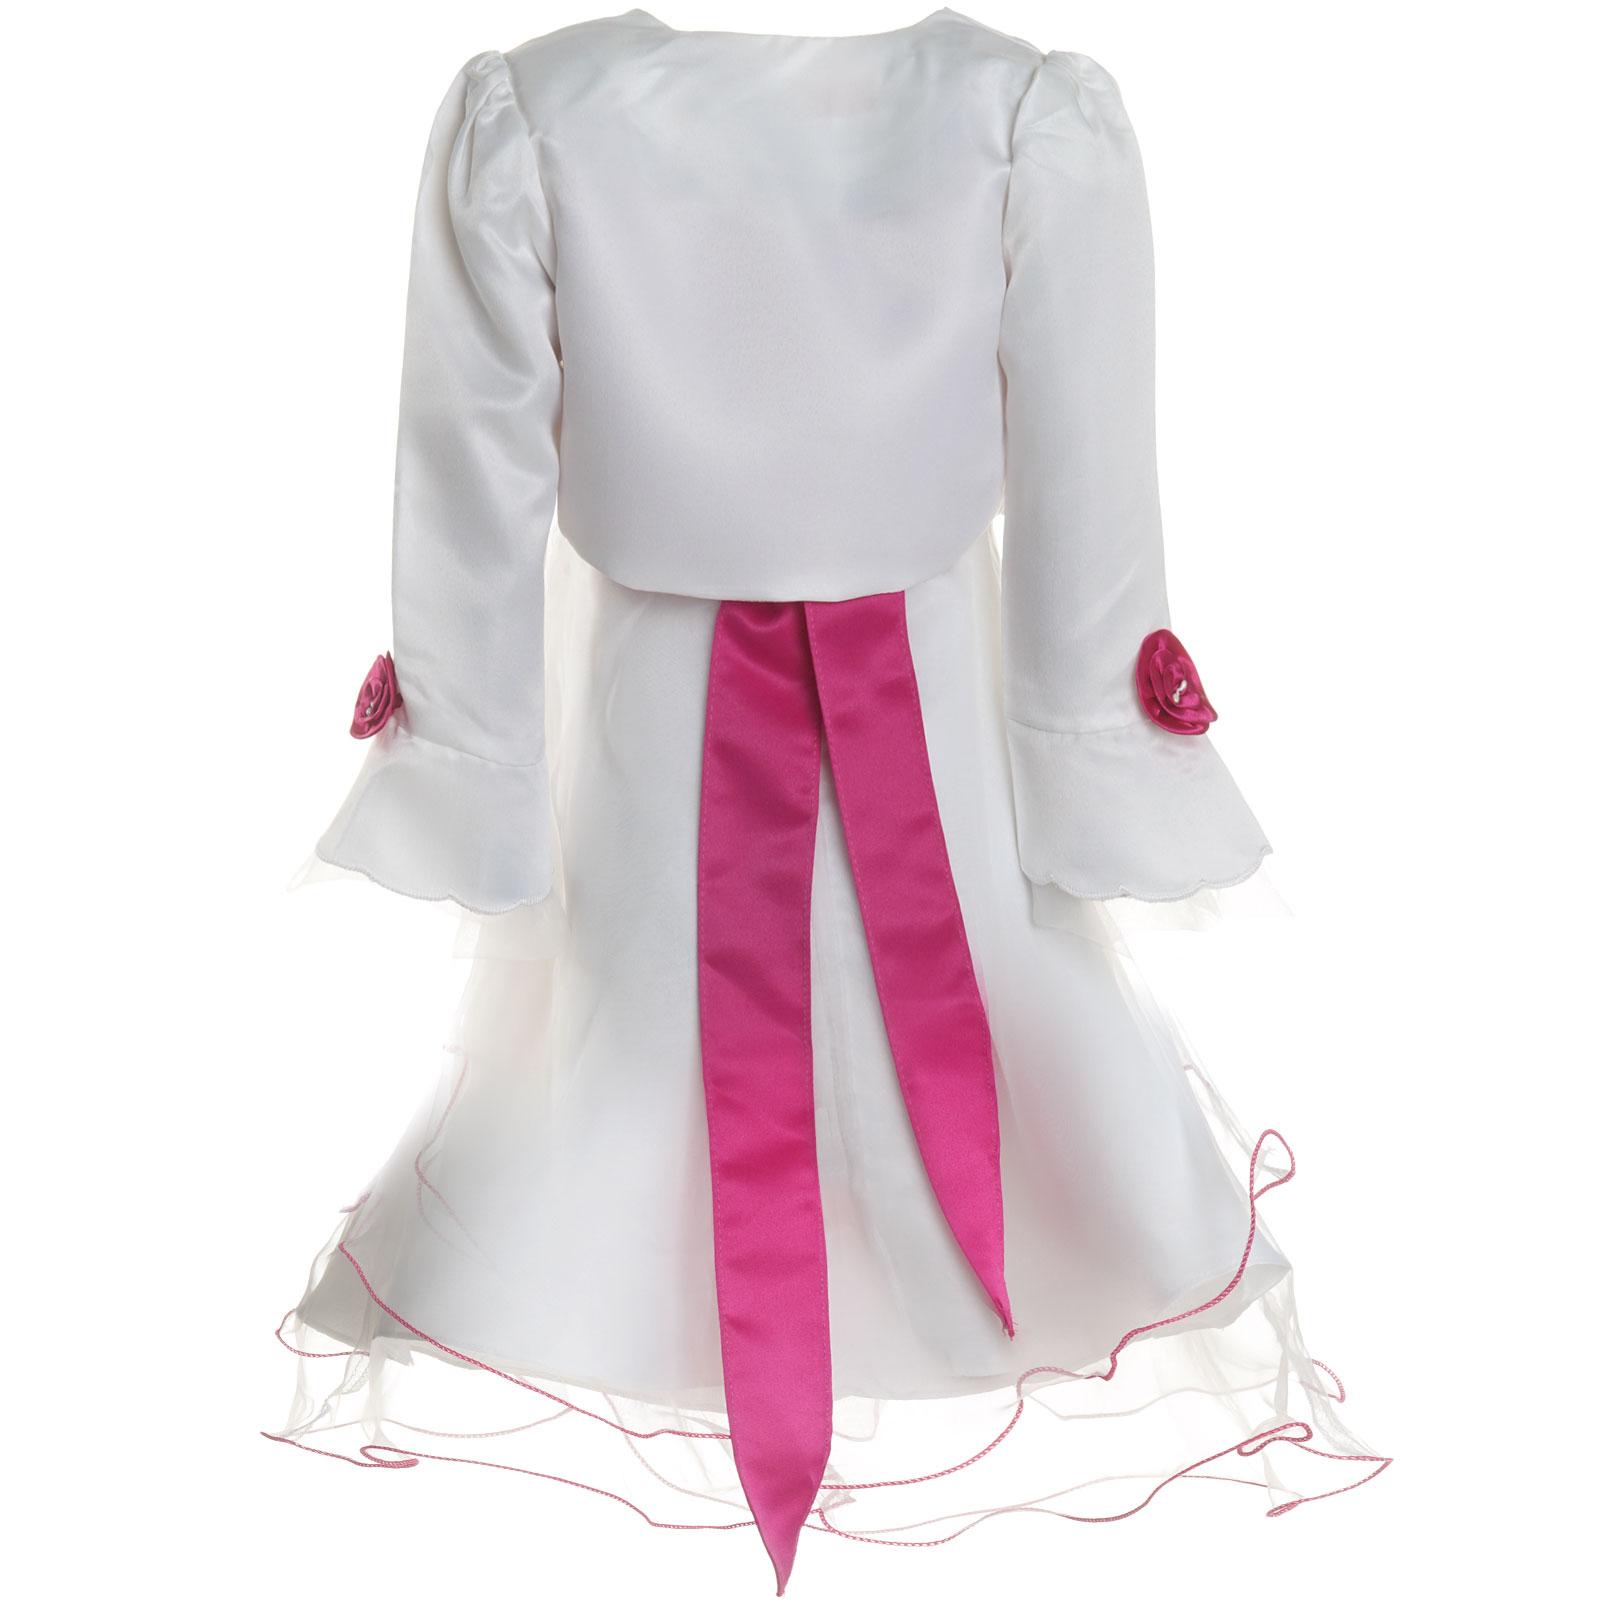 Maedchen-Kinder-Kleid-Peticoat-Festkleid-Lang-Arm-Kostuem-mit-Bolero-Rose-21476 Indexbild 11